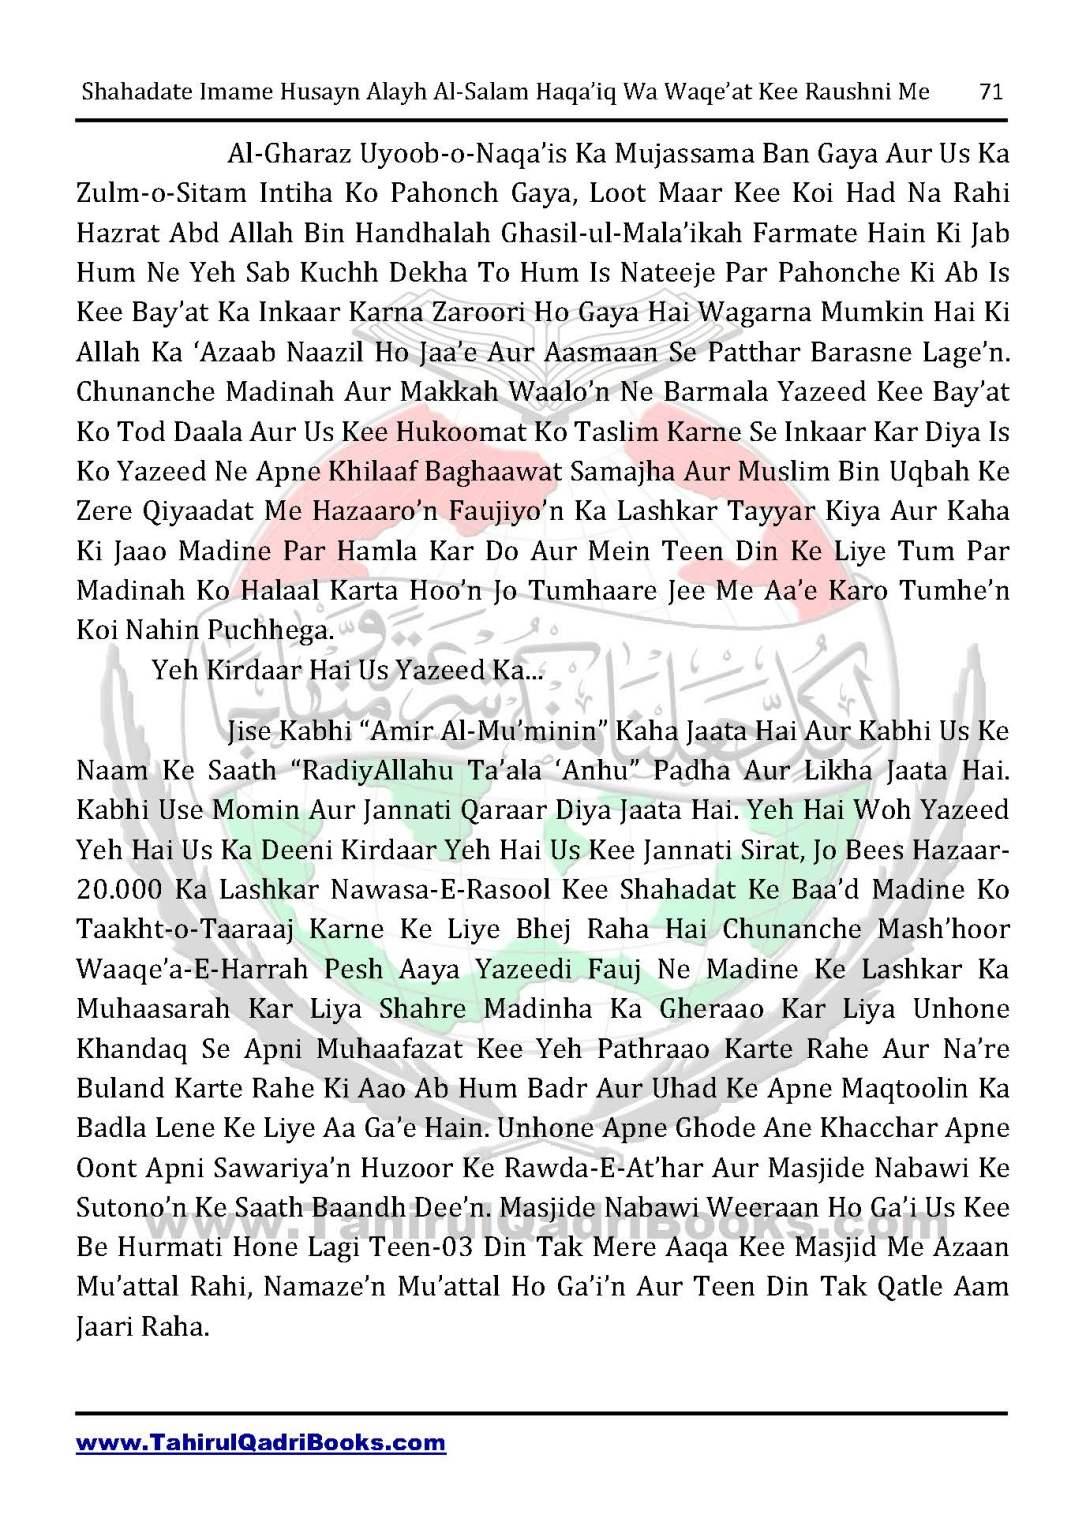 shahadate-imame-husayn-alayh-is-salam-haqaiq-wa-waqe_at-kee-raushni-me-in-roman-urdu-unlocked_Page_71